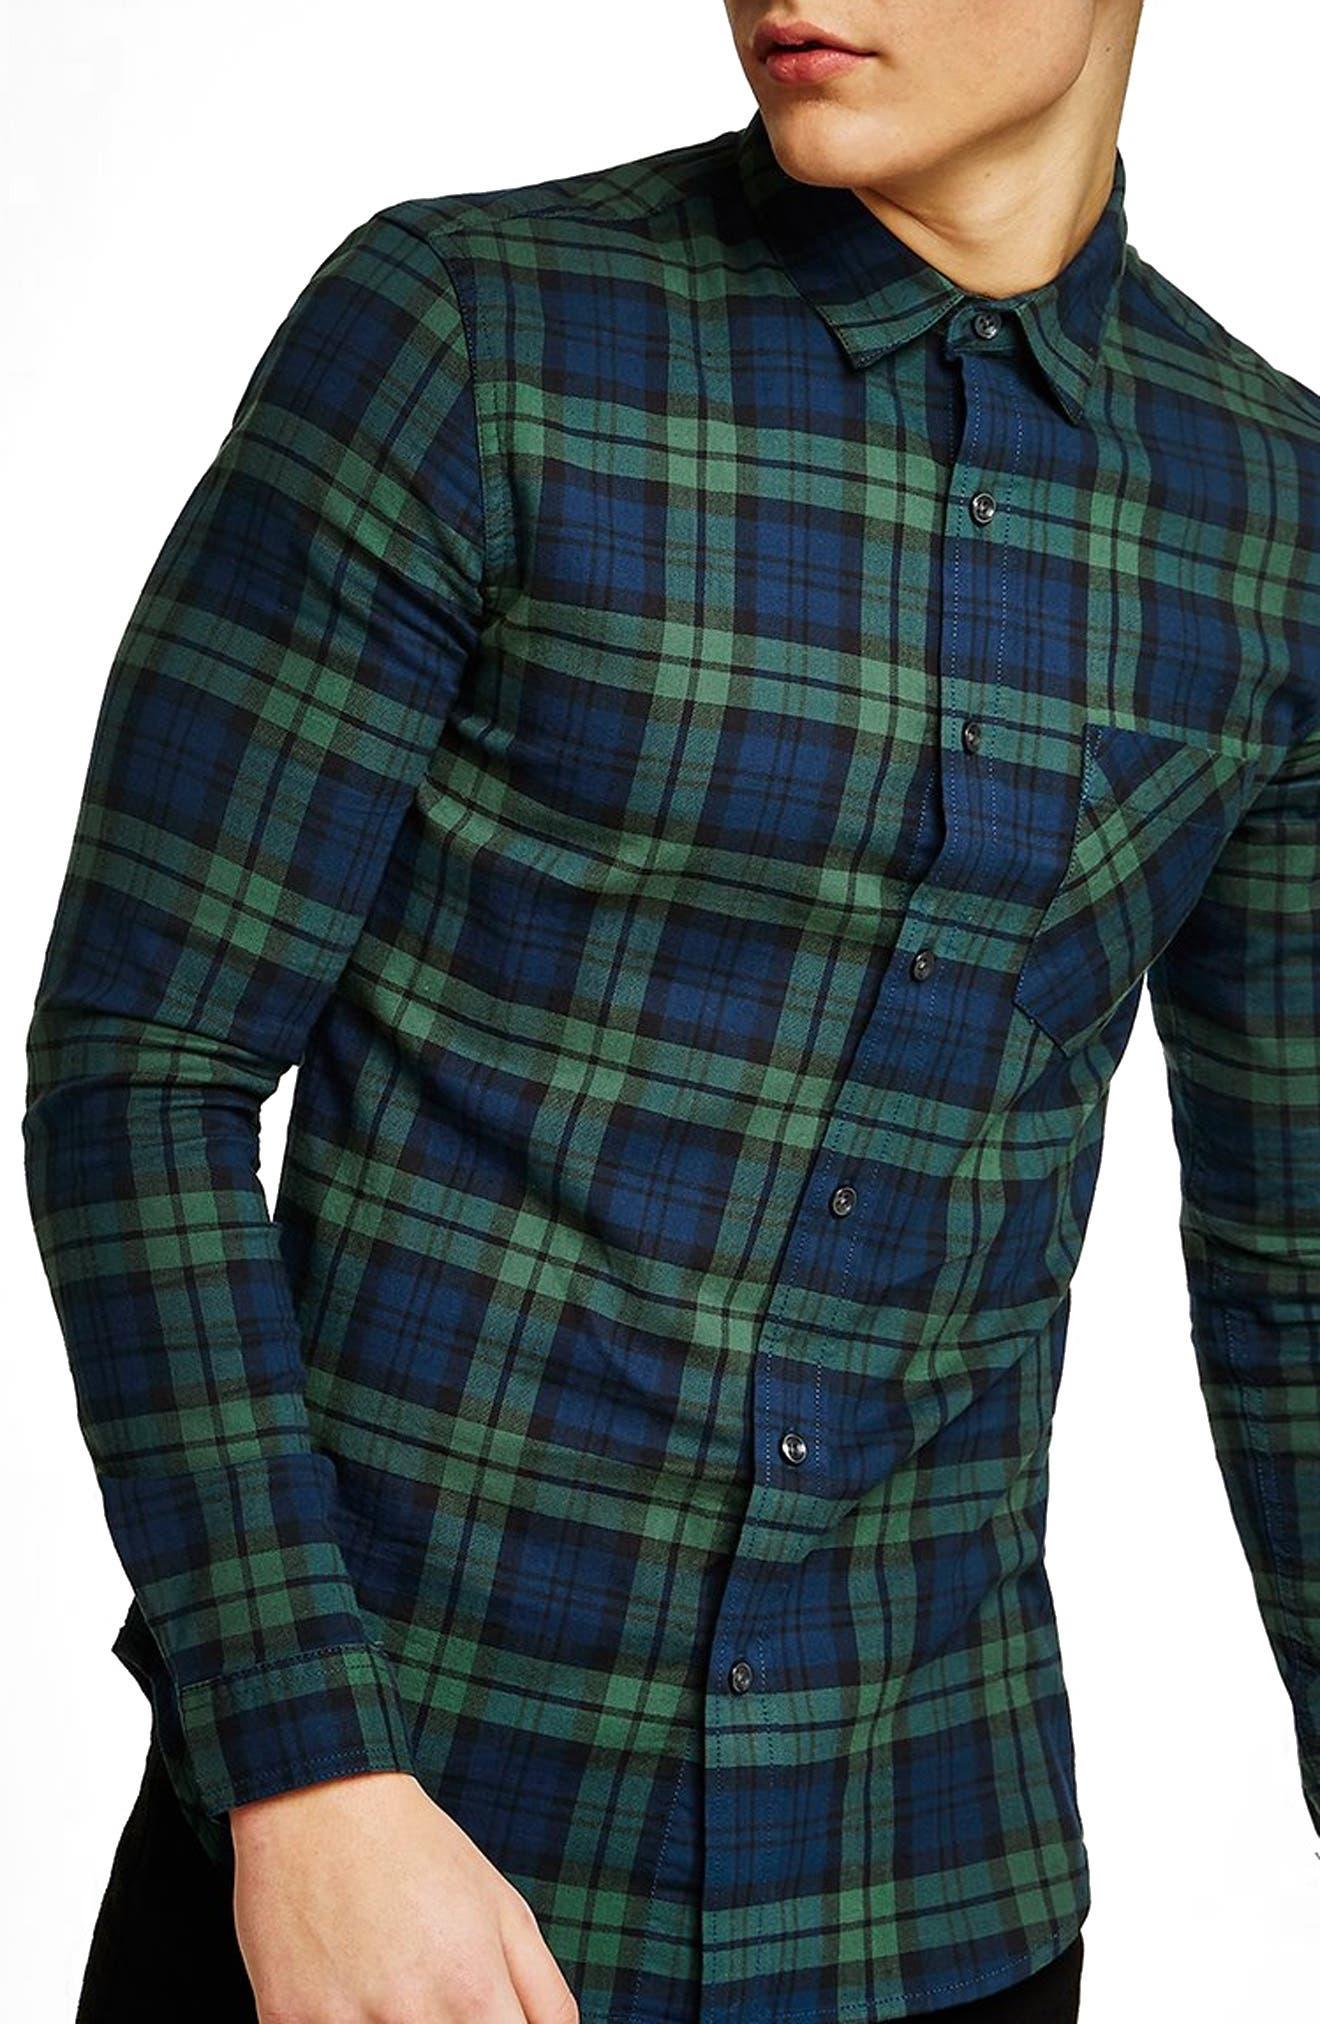 Muscle Fit Black Watch Plaid Shirt,                             Main thumbnail 1, color,                             411